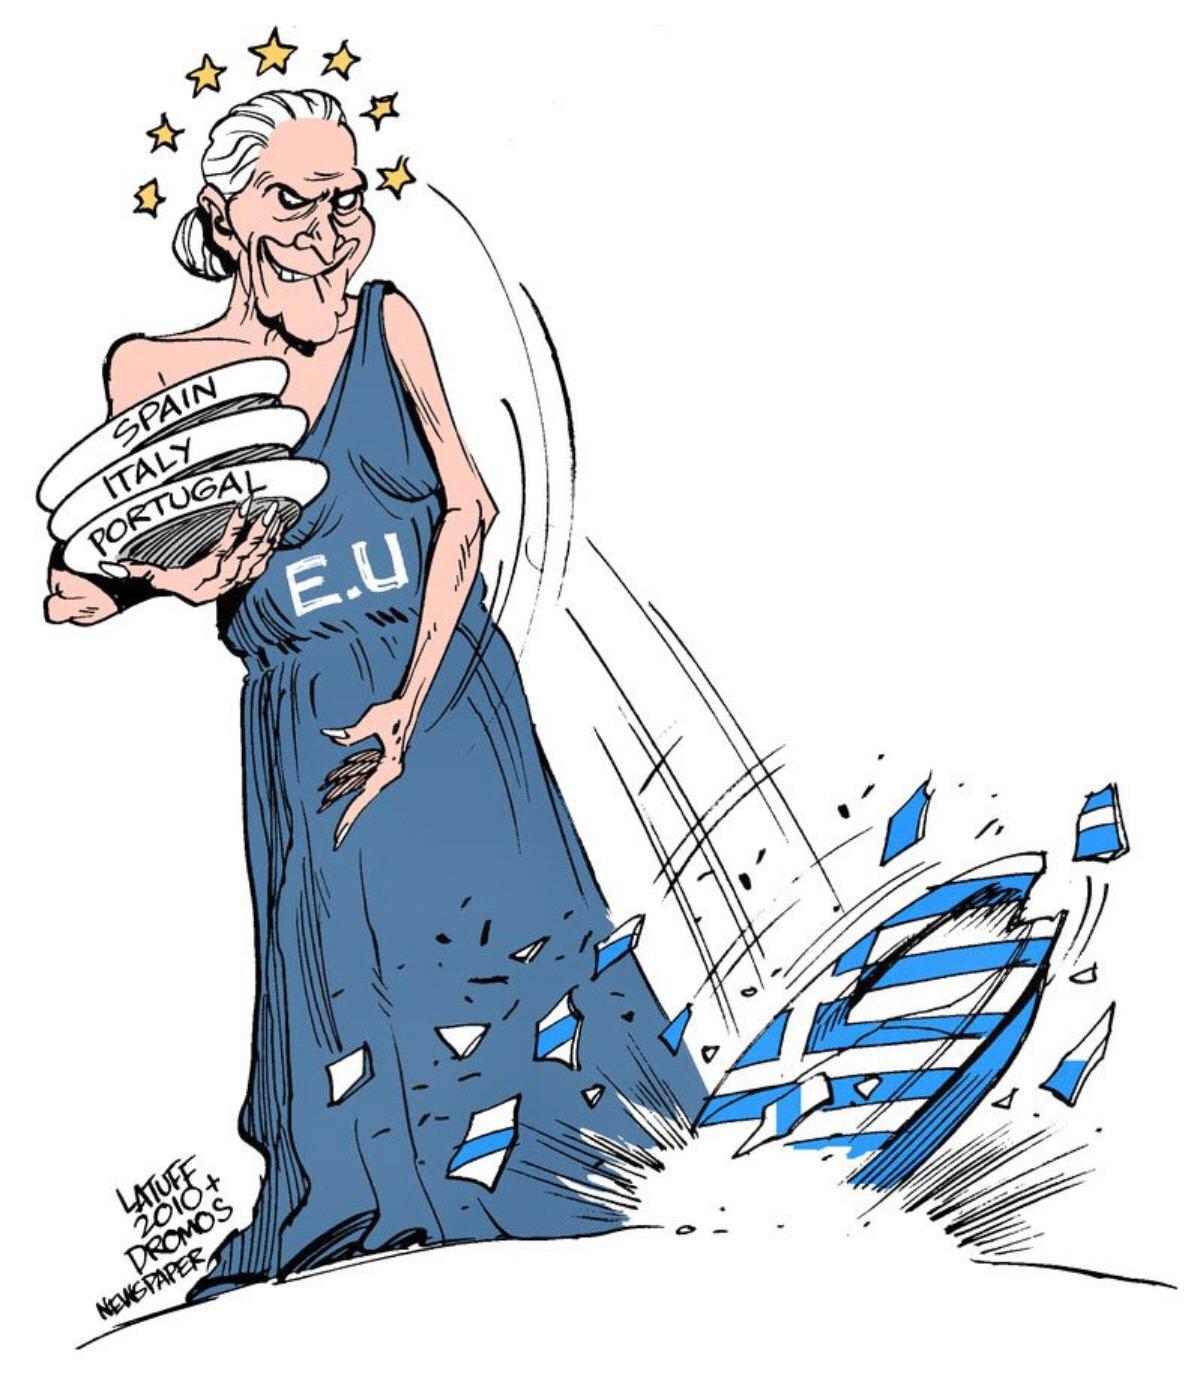 00 Carlos Latuff. Greek economic Crisis. 2010